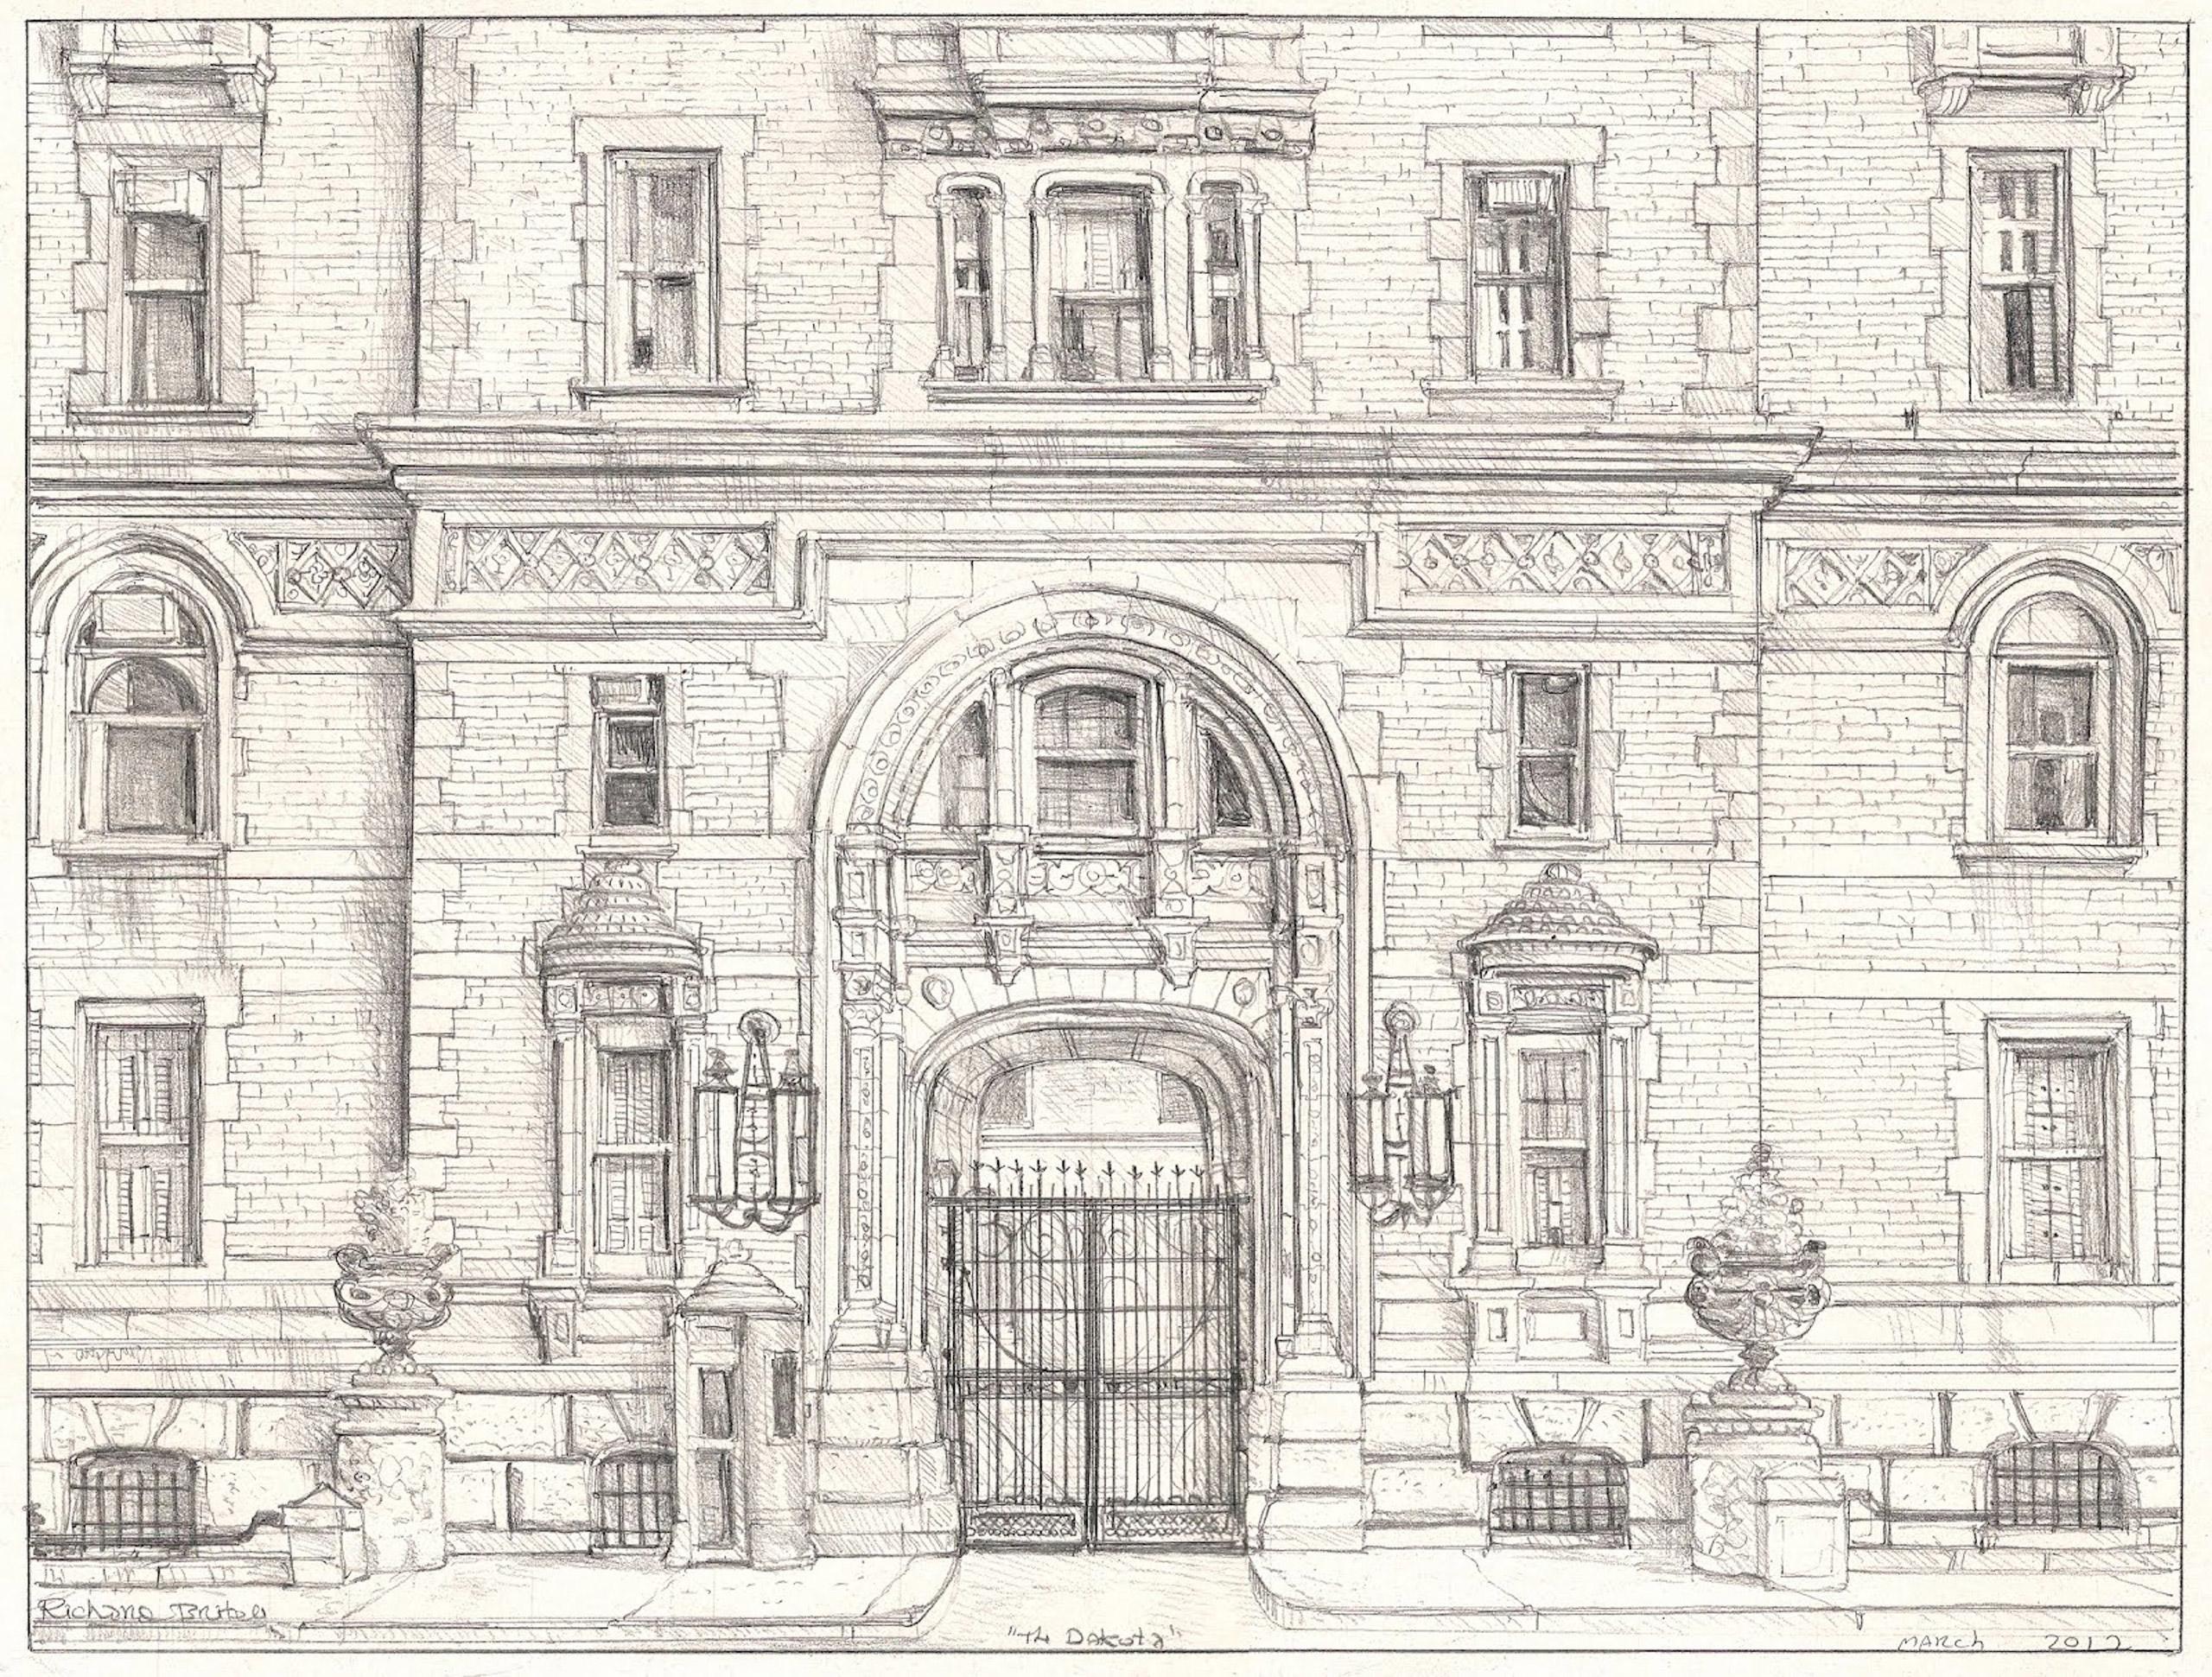 Pencil drawing of the Dakota entrance by Richard Britell.